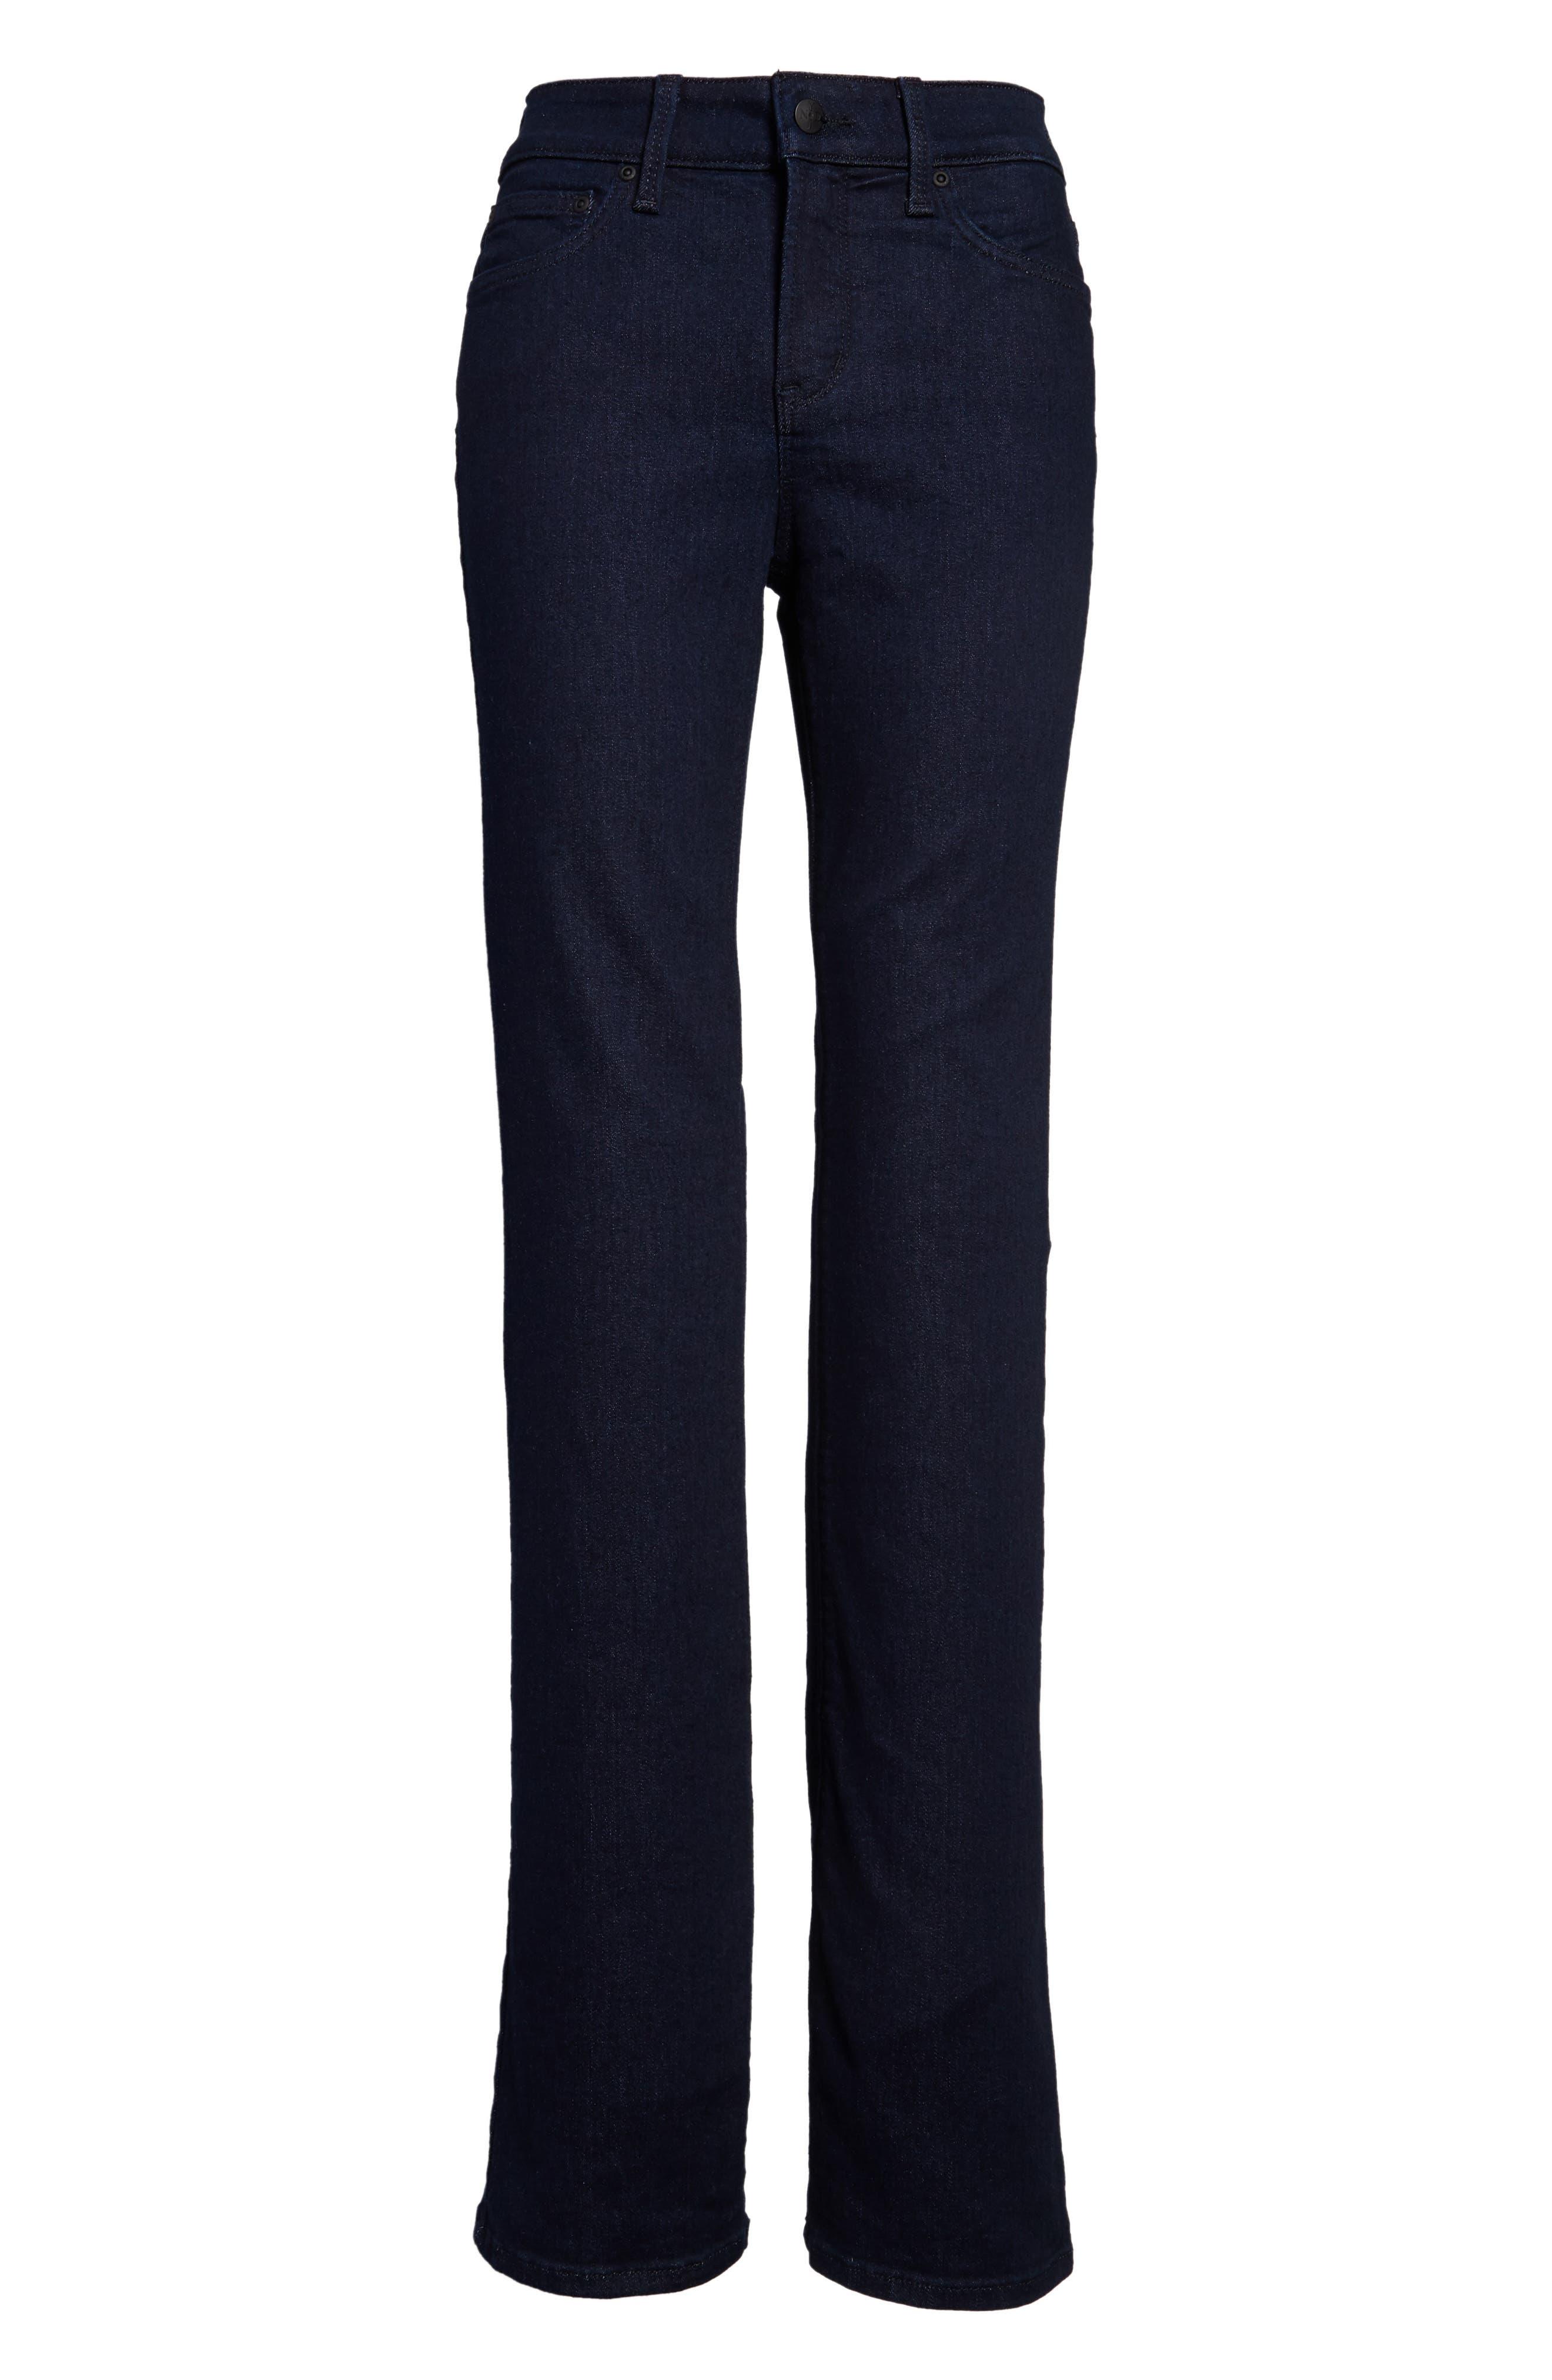 NYDJ, Barbara High Waist Stretch Bootcut Jeans, Alternate thumbnail 5, color, RINSE